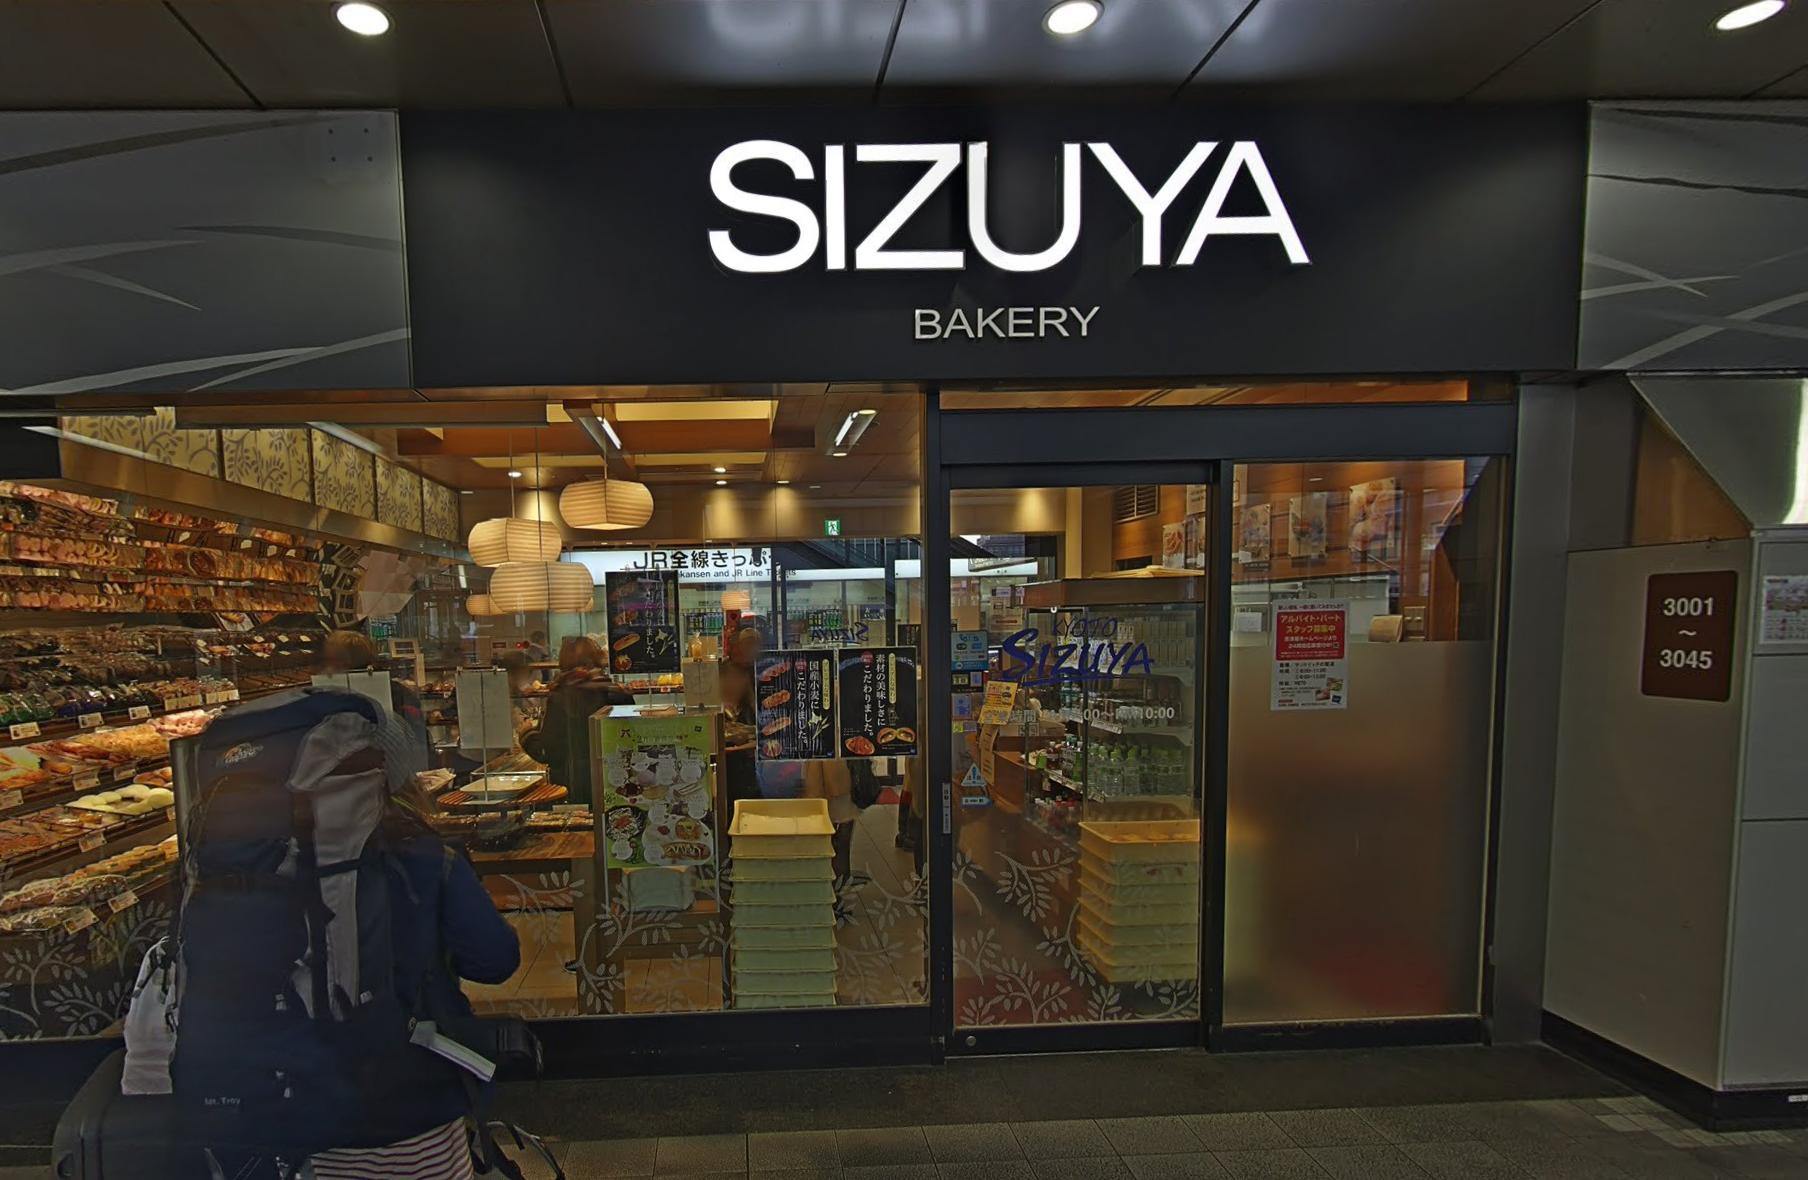 Sizuya Bakery